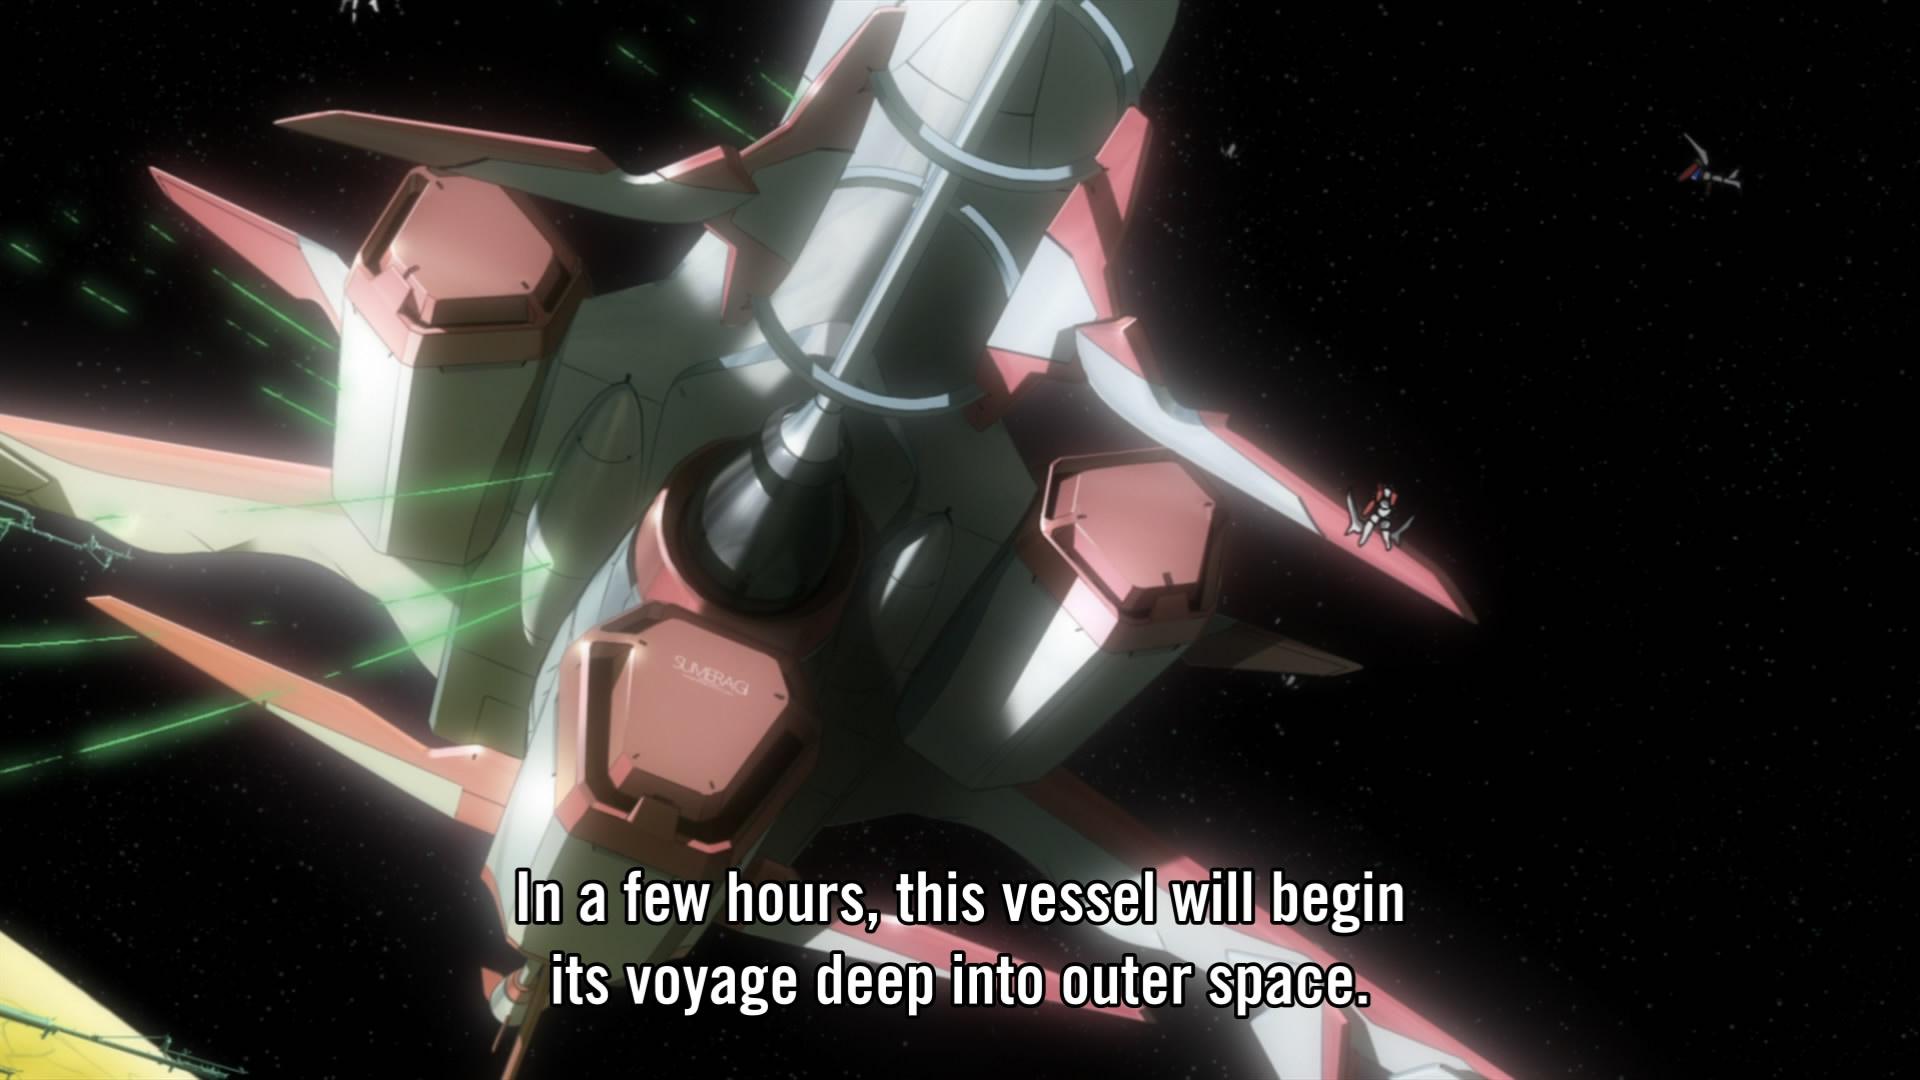 [gSS]_Mobile_Suit_Gundam_00_-_A_wakening_of_the_Trailblazer_(1080p)_[2B252856].mkv_snapshot_01.58.35_[2011.01.07_04.57.08]